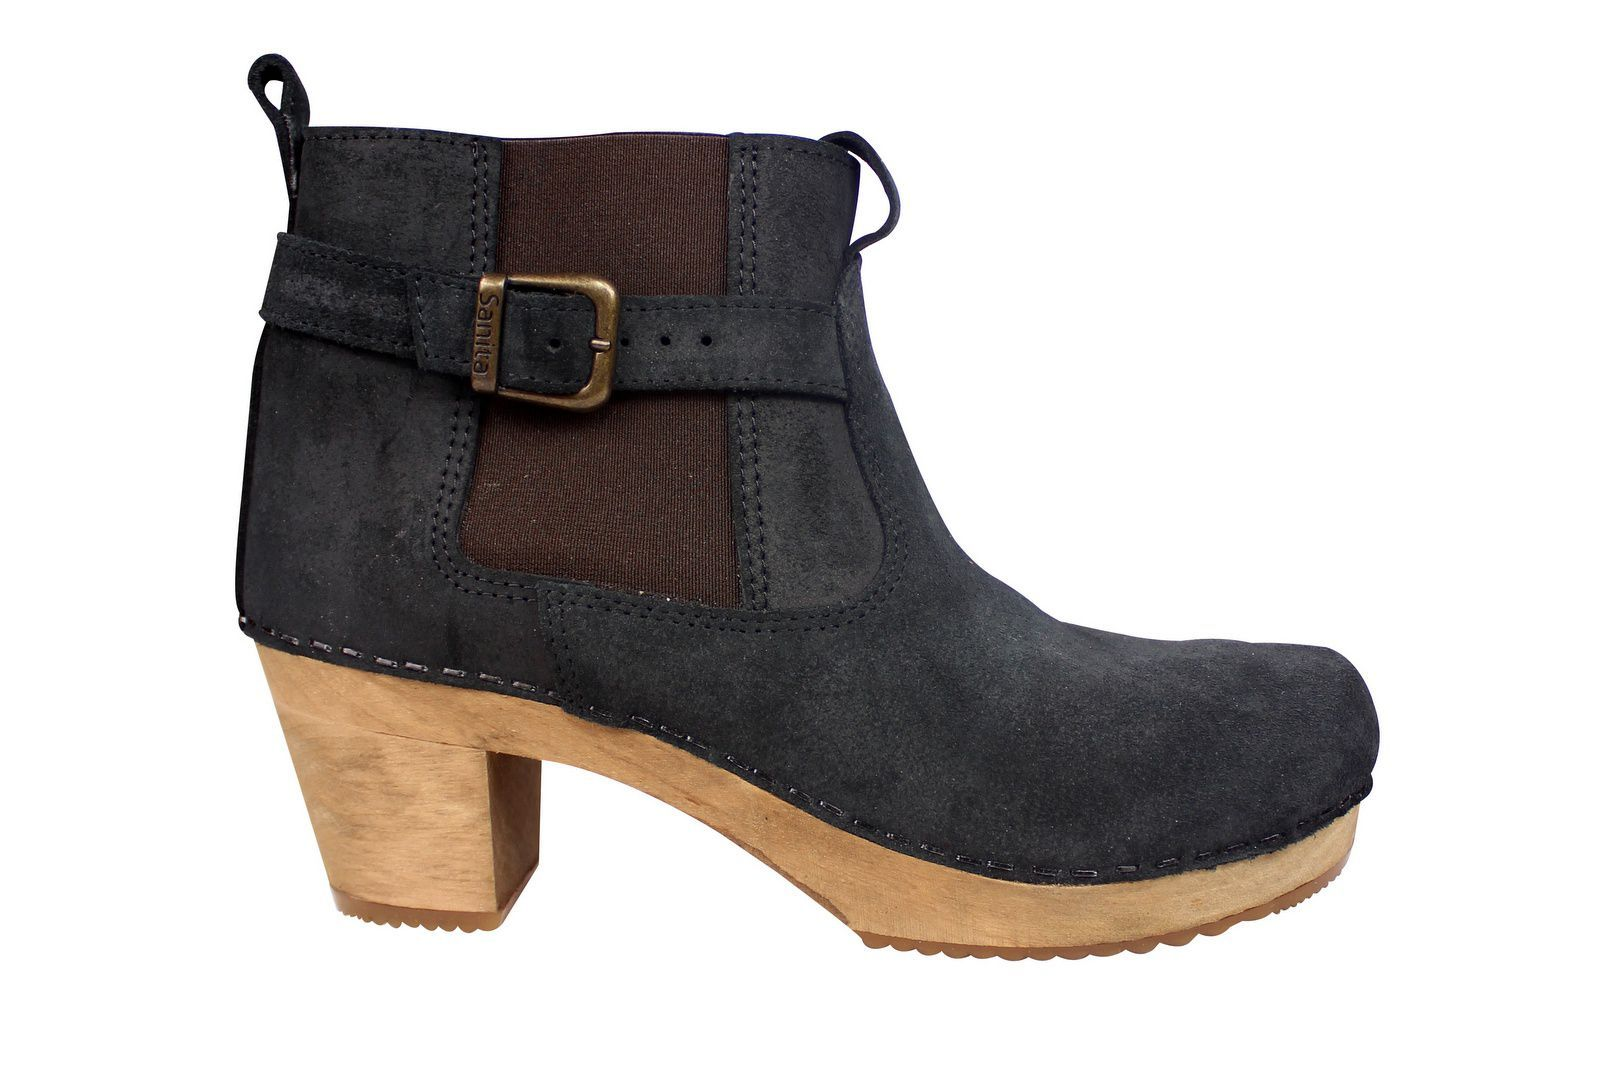 Sanita Peggy Sue Jodphur style ankle boots Black Side